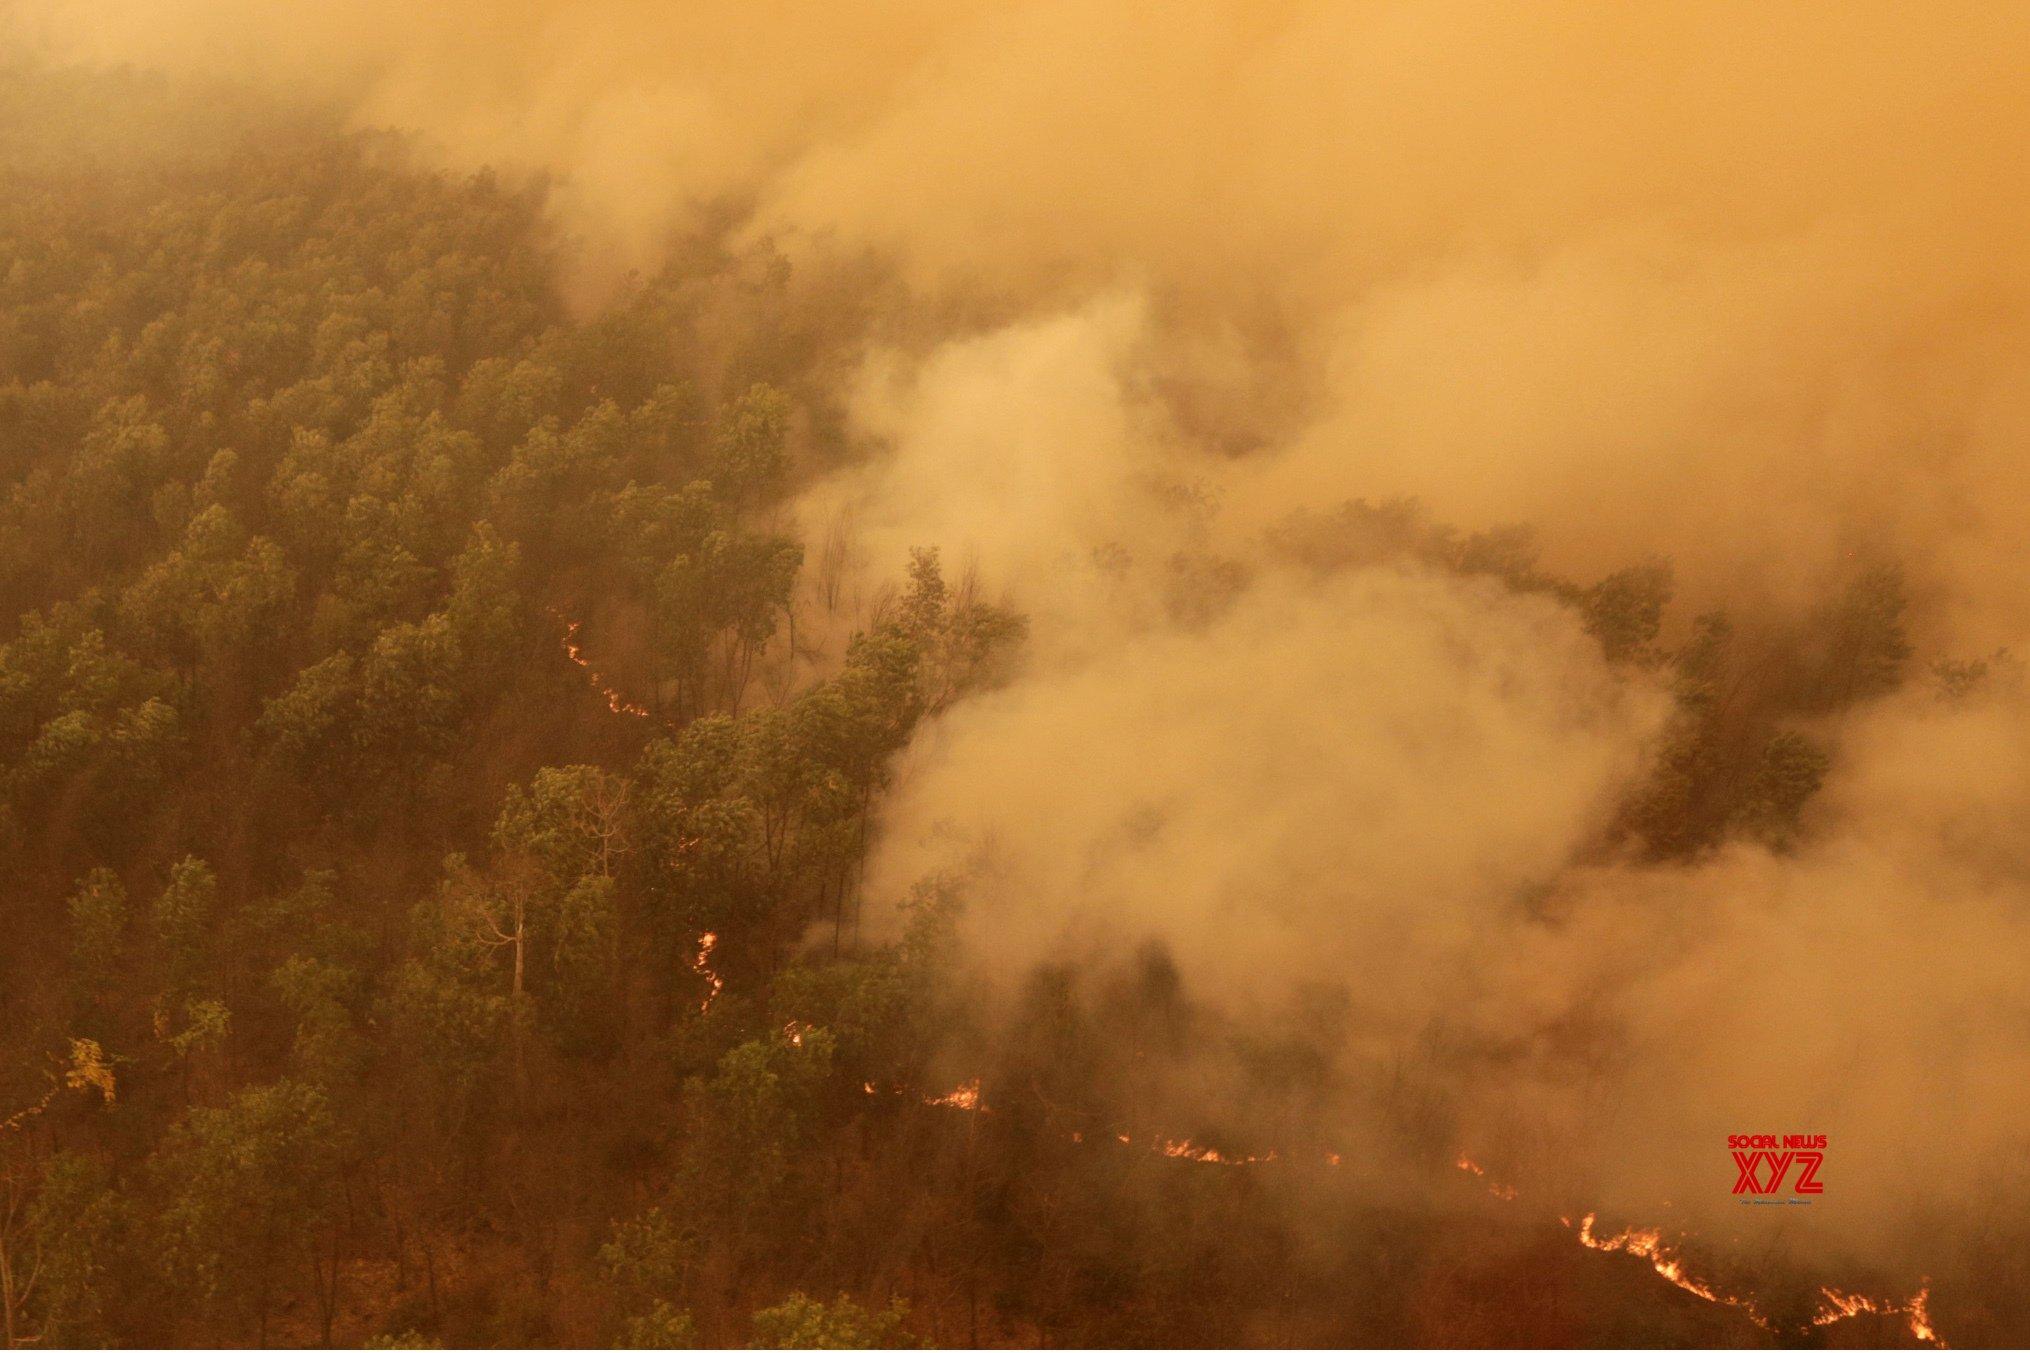 3 killed as more than 70 bushfires rage in Australia